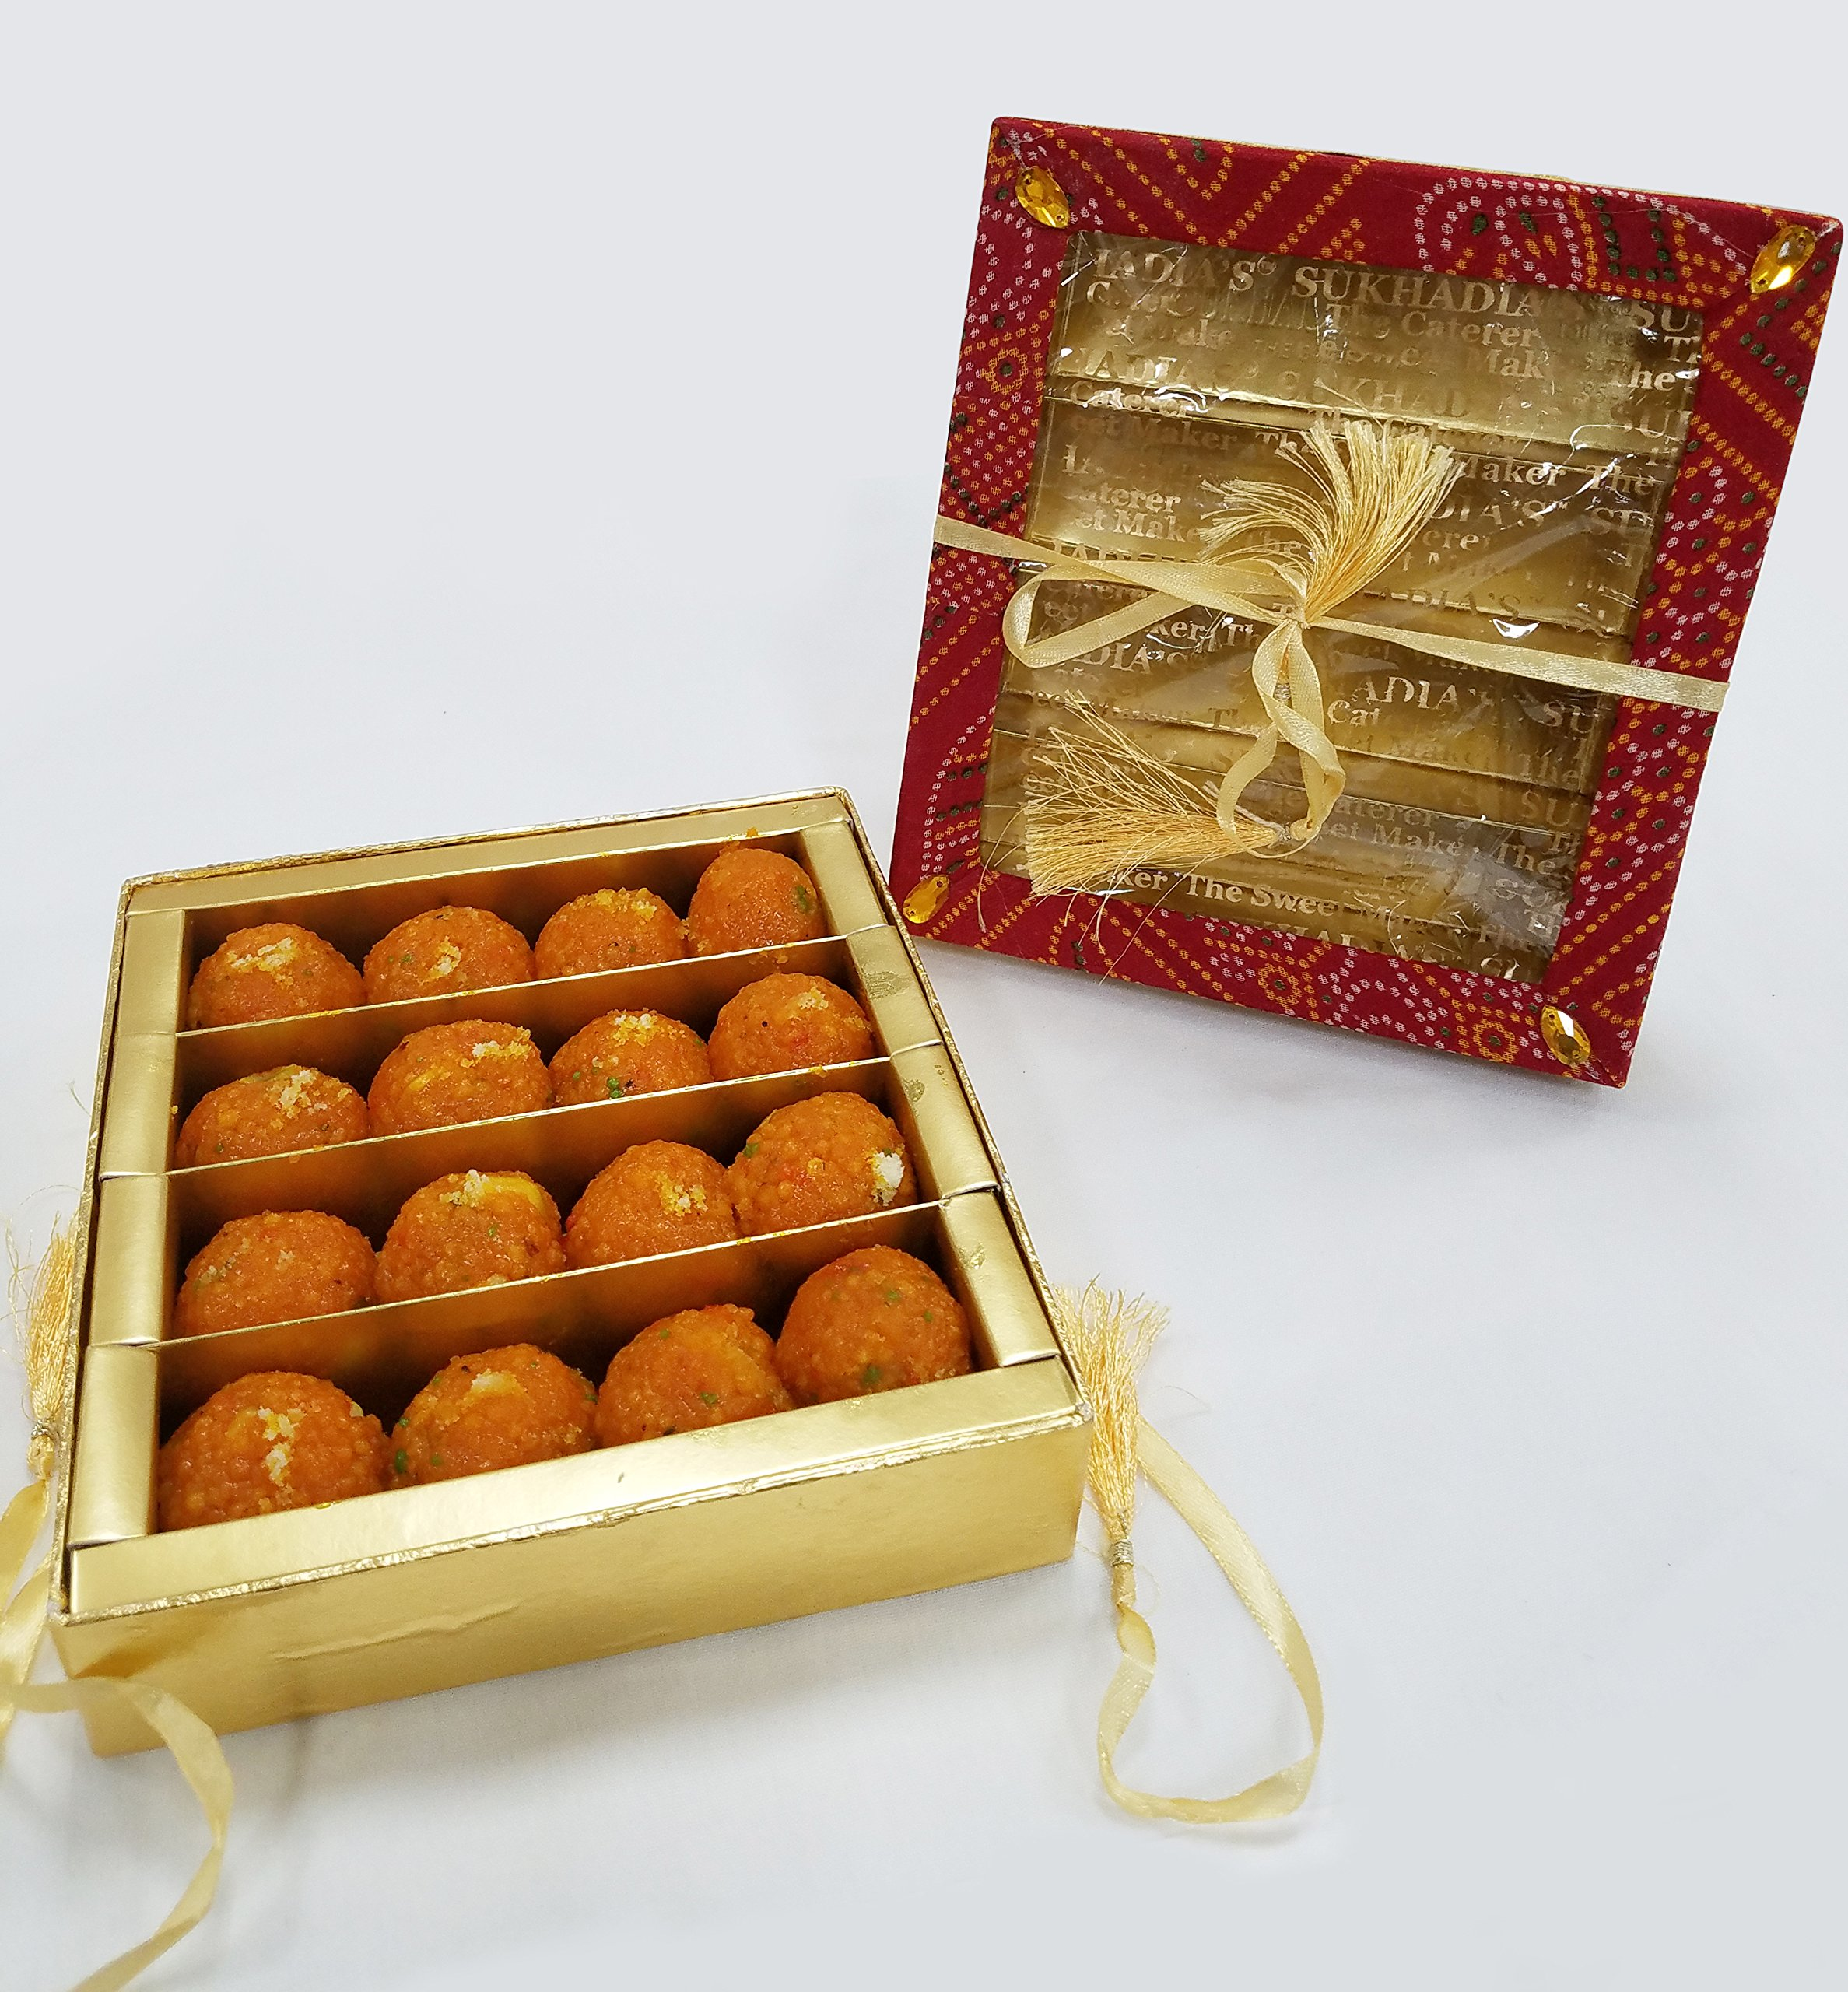 Sukhadia's Motichoor Ladoo Indian Sweet, Fancy Bandhani Box (20oz)